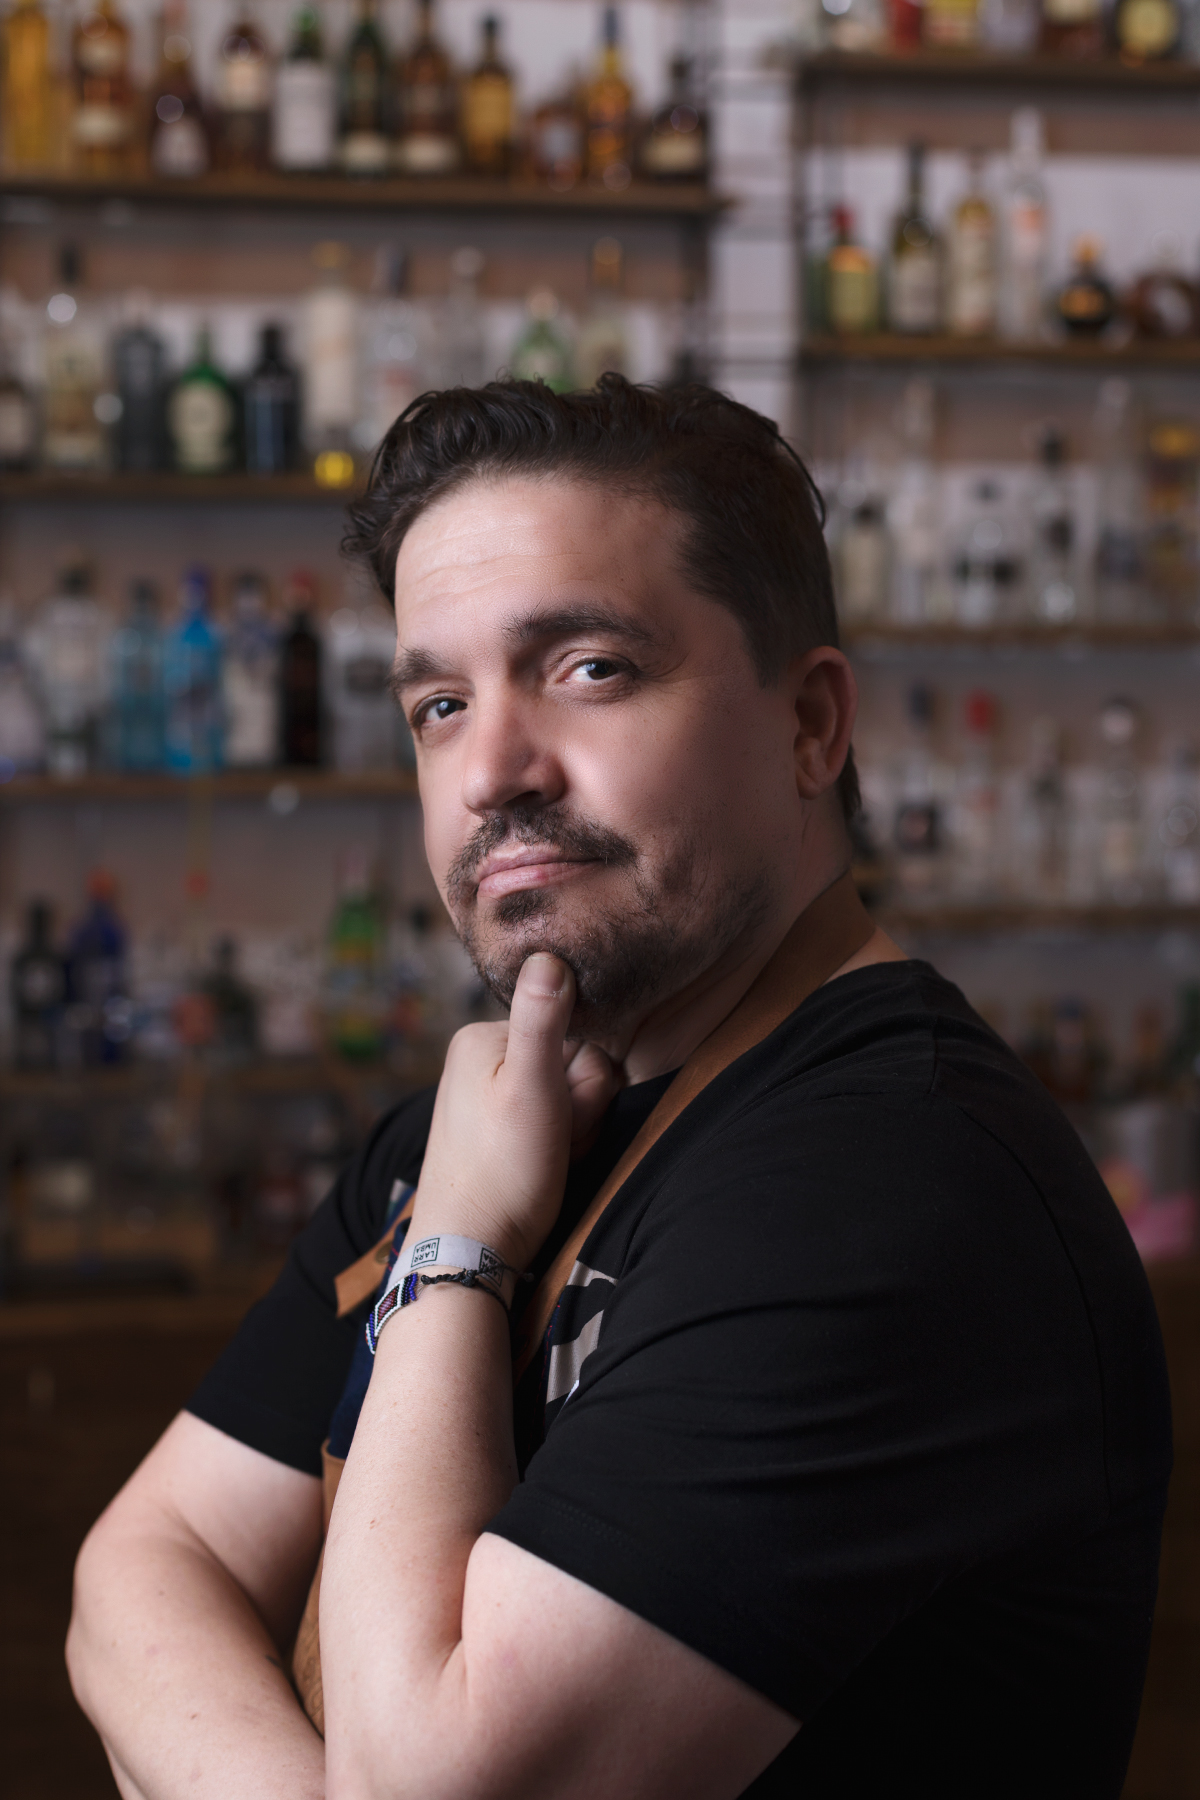 359-Cocktail-Salmon-Guru-Carlos-Moreno-Larrumba-cocktails-mixology-bartending-cocteleria-Sr-Erreka-photo.jpg